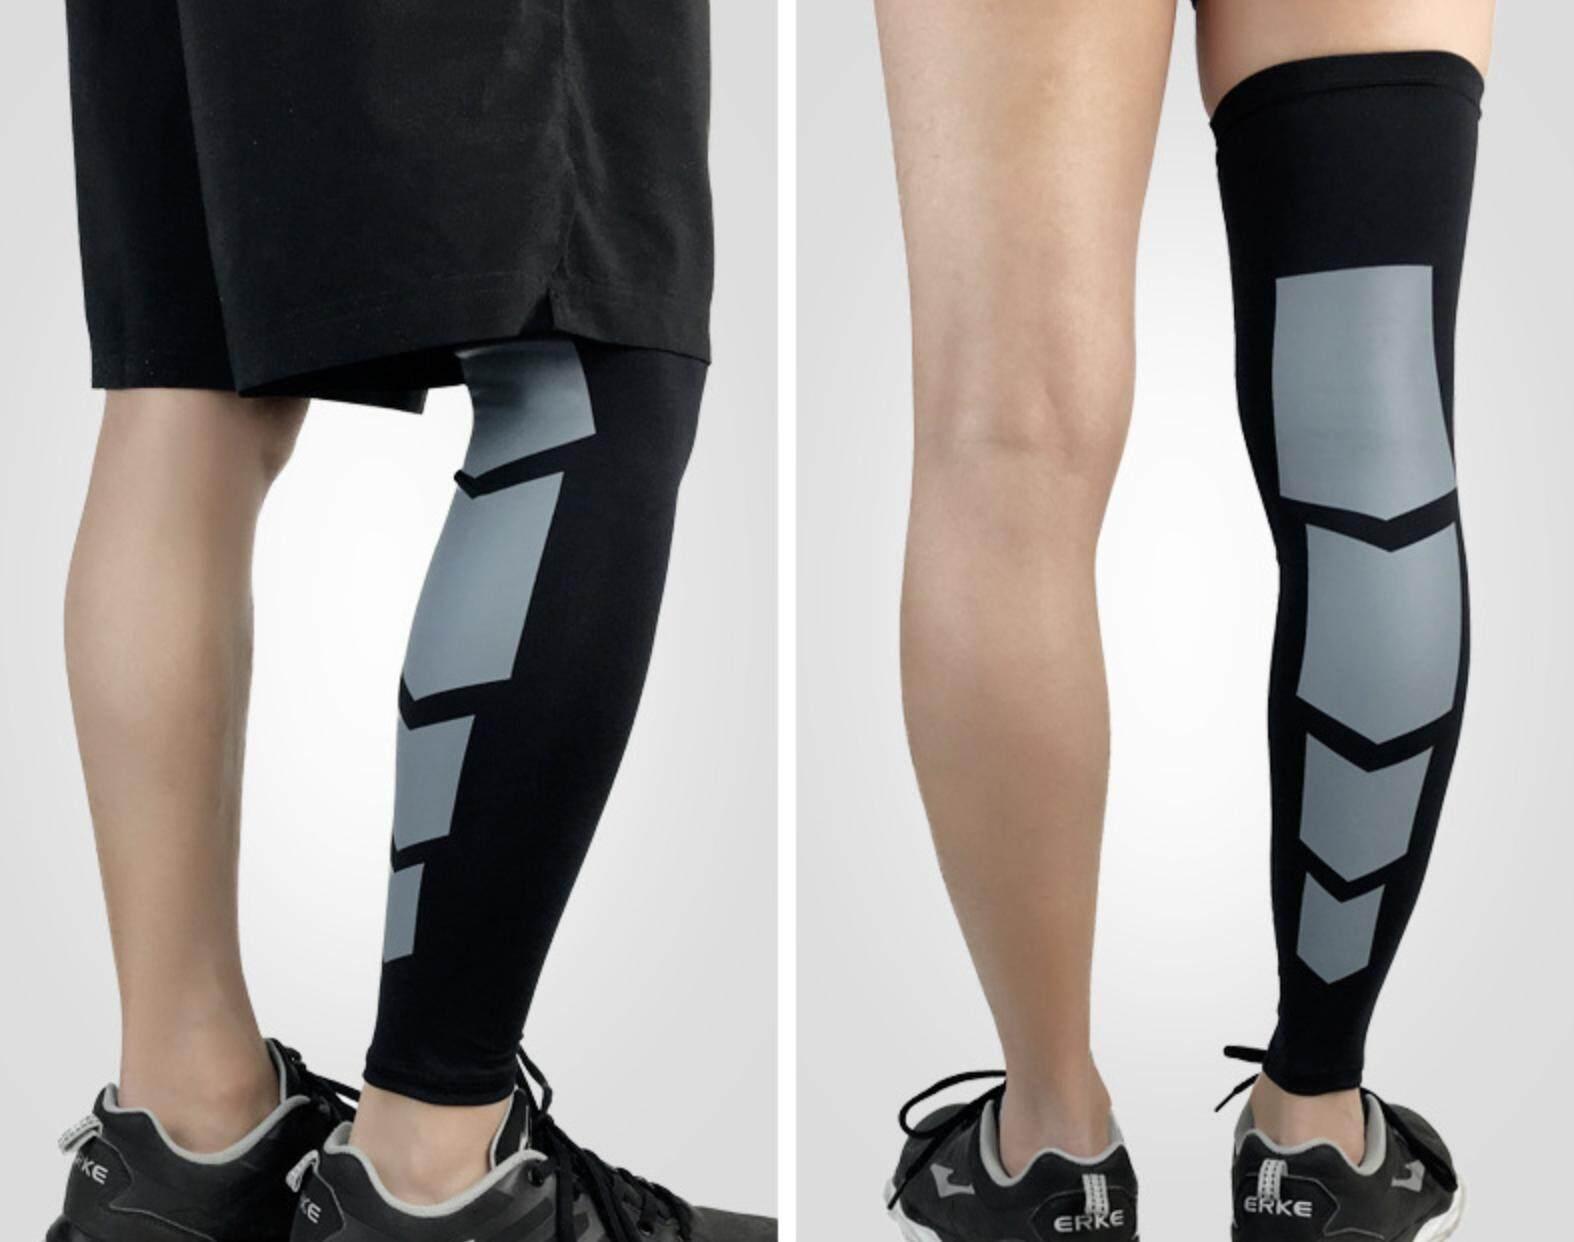 (x2ชิ้น) ปลอกรัดน่อง ปลอกขาแบบยาว ปลอกขาใส่ออกกำลังกาย วิ่ง ปั่นจักรยาน ลดการเมื่อยล้า กระชับกล้ามเนื้อน่อง Elastic Calf Support